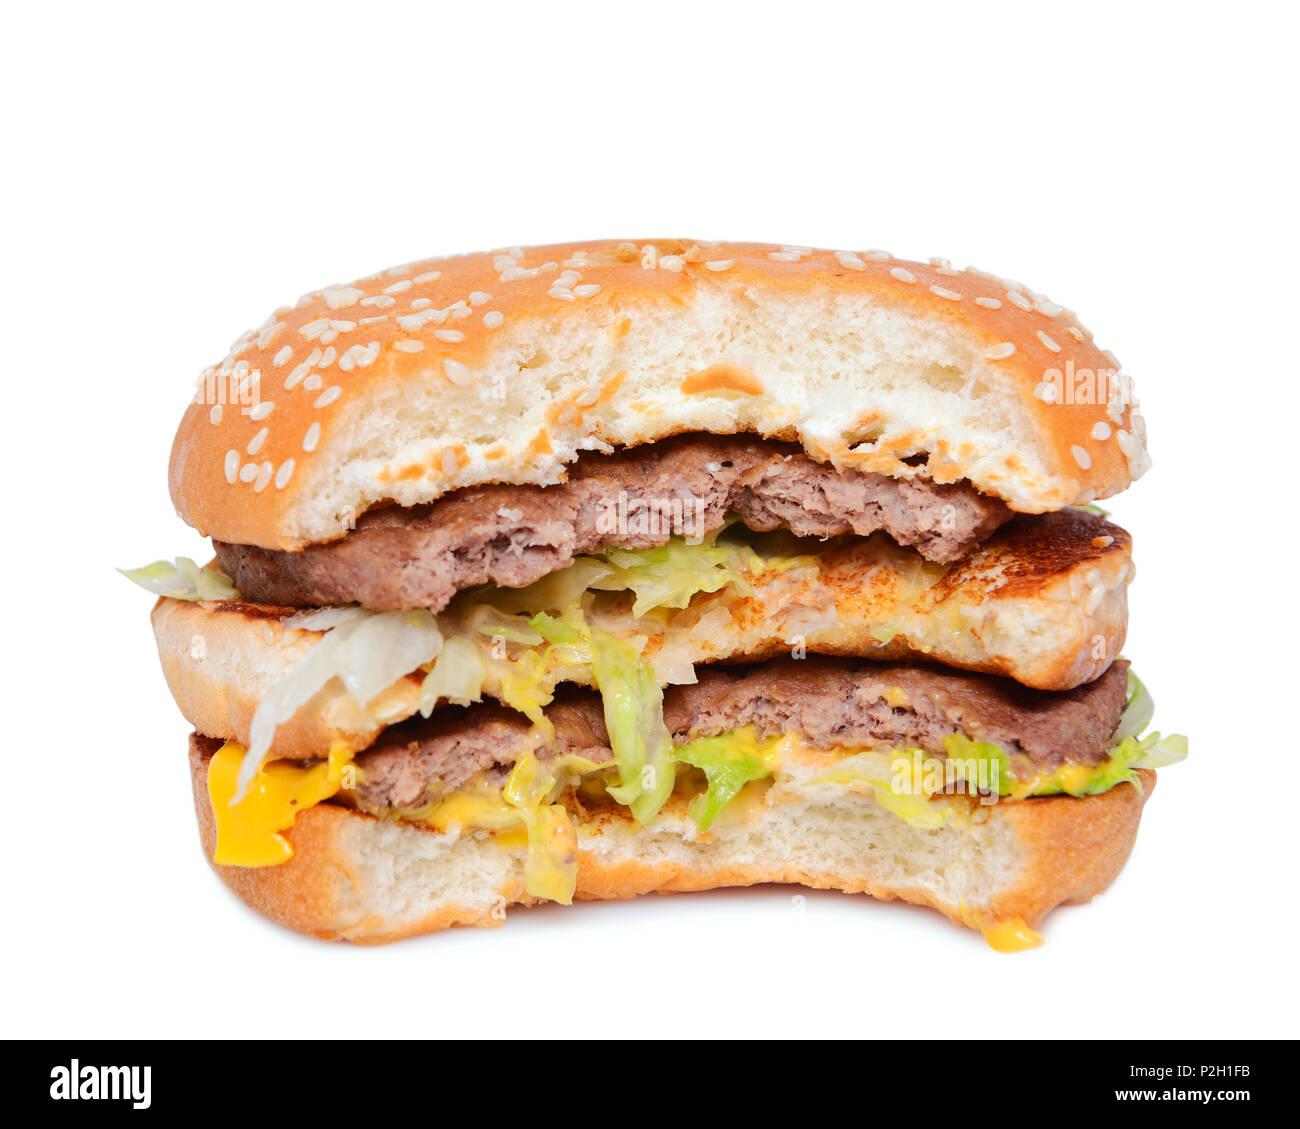 Burger contra un fondo blanco, Cerrar Imagen De Stock